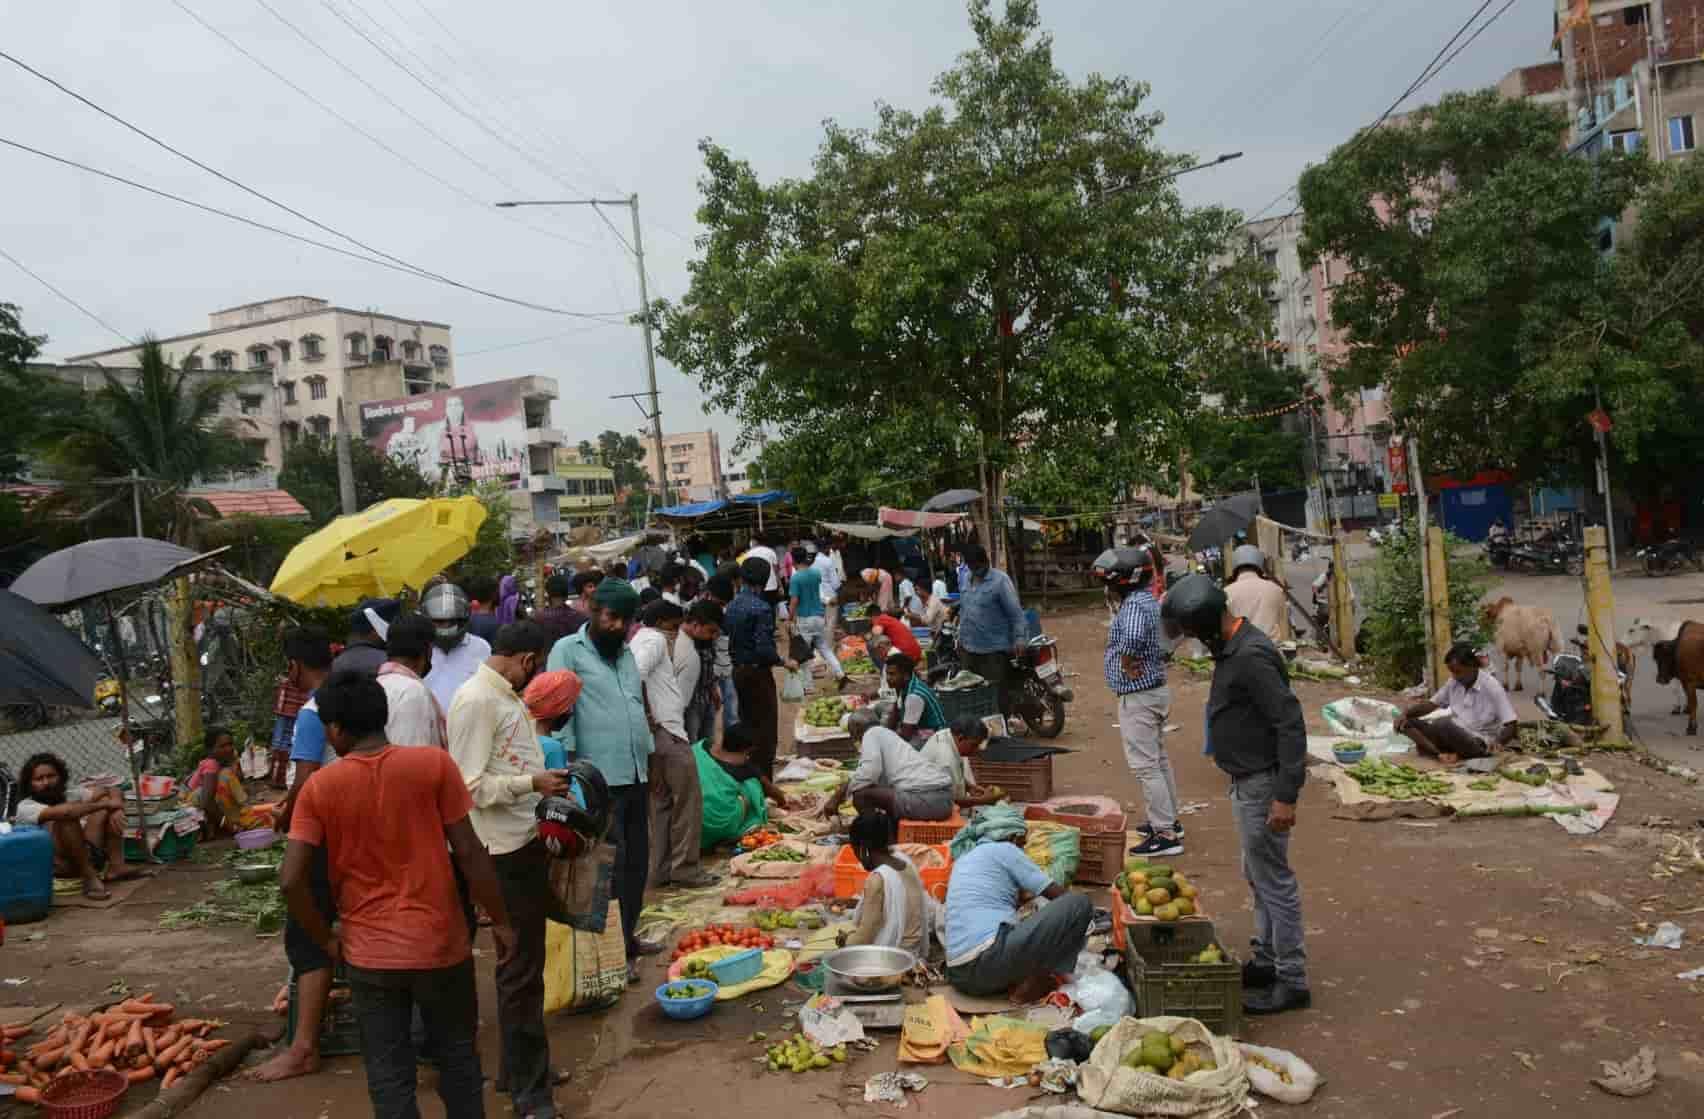 Vegetable vendors do brisk business on the median of Dimna Road near Blue Bells School in Jamshedpur on Tuesday.